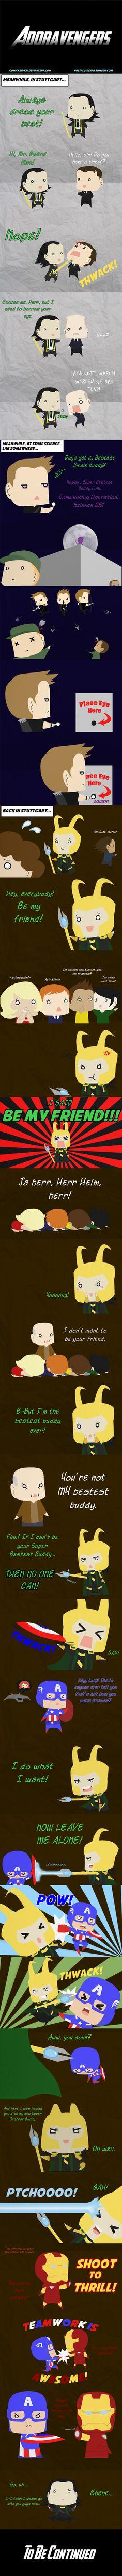 SPOILERS: Adoravengers: Scene Eight by Comicker-Kai.deviantart.com on @deviantART